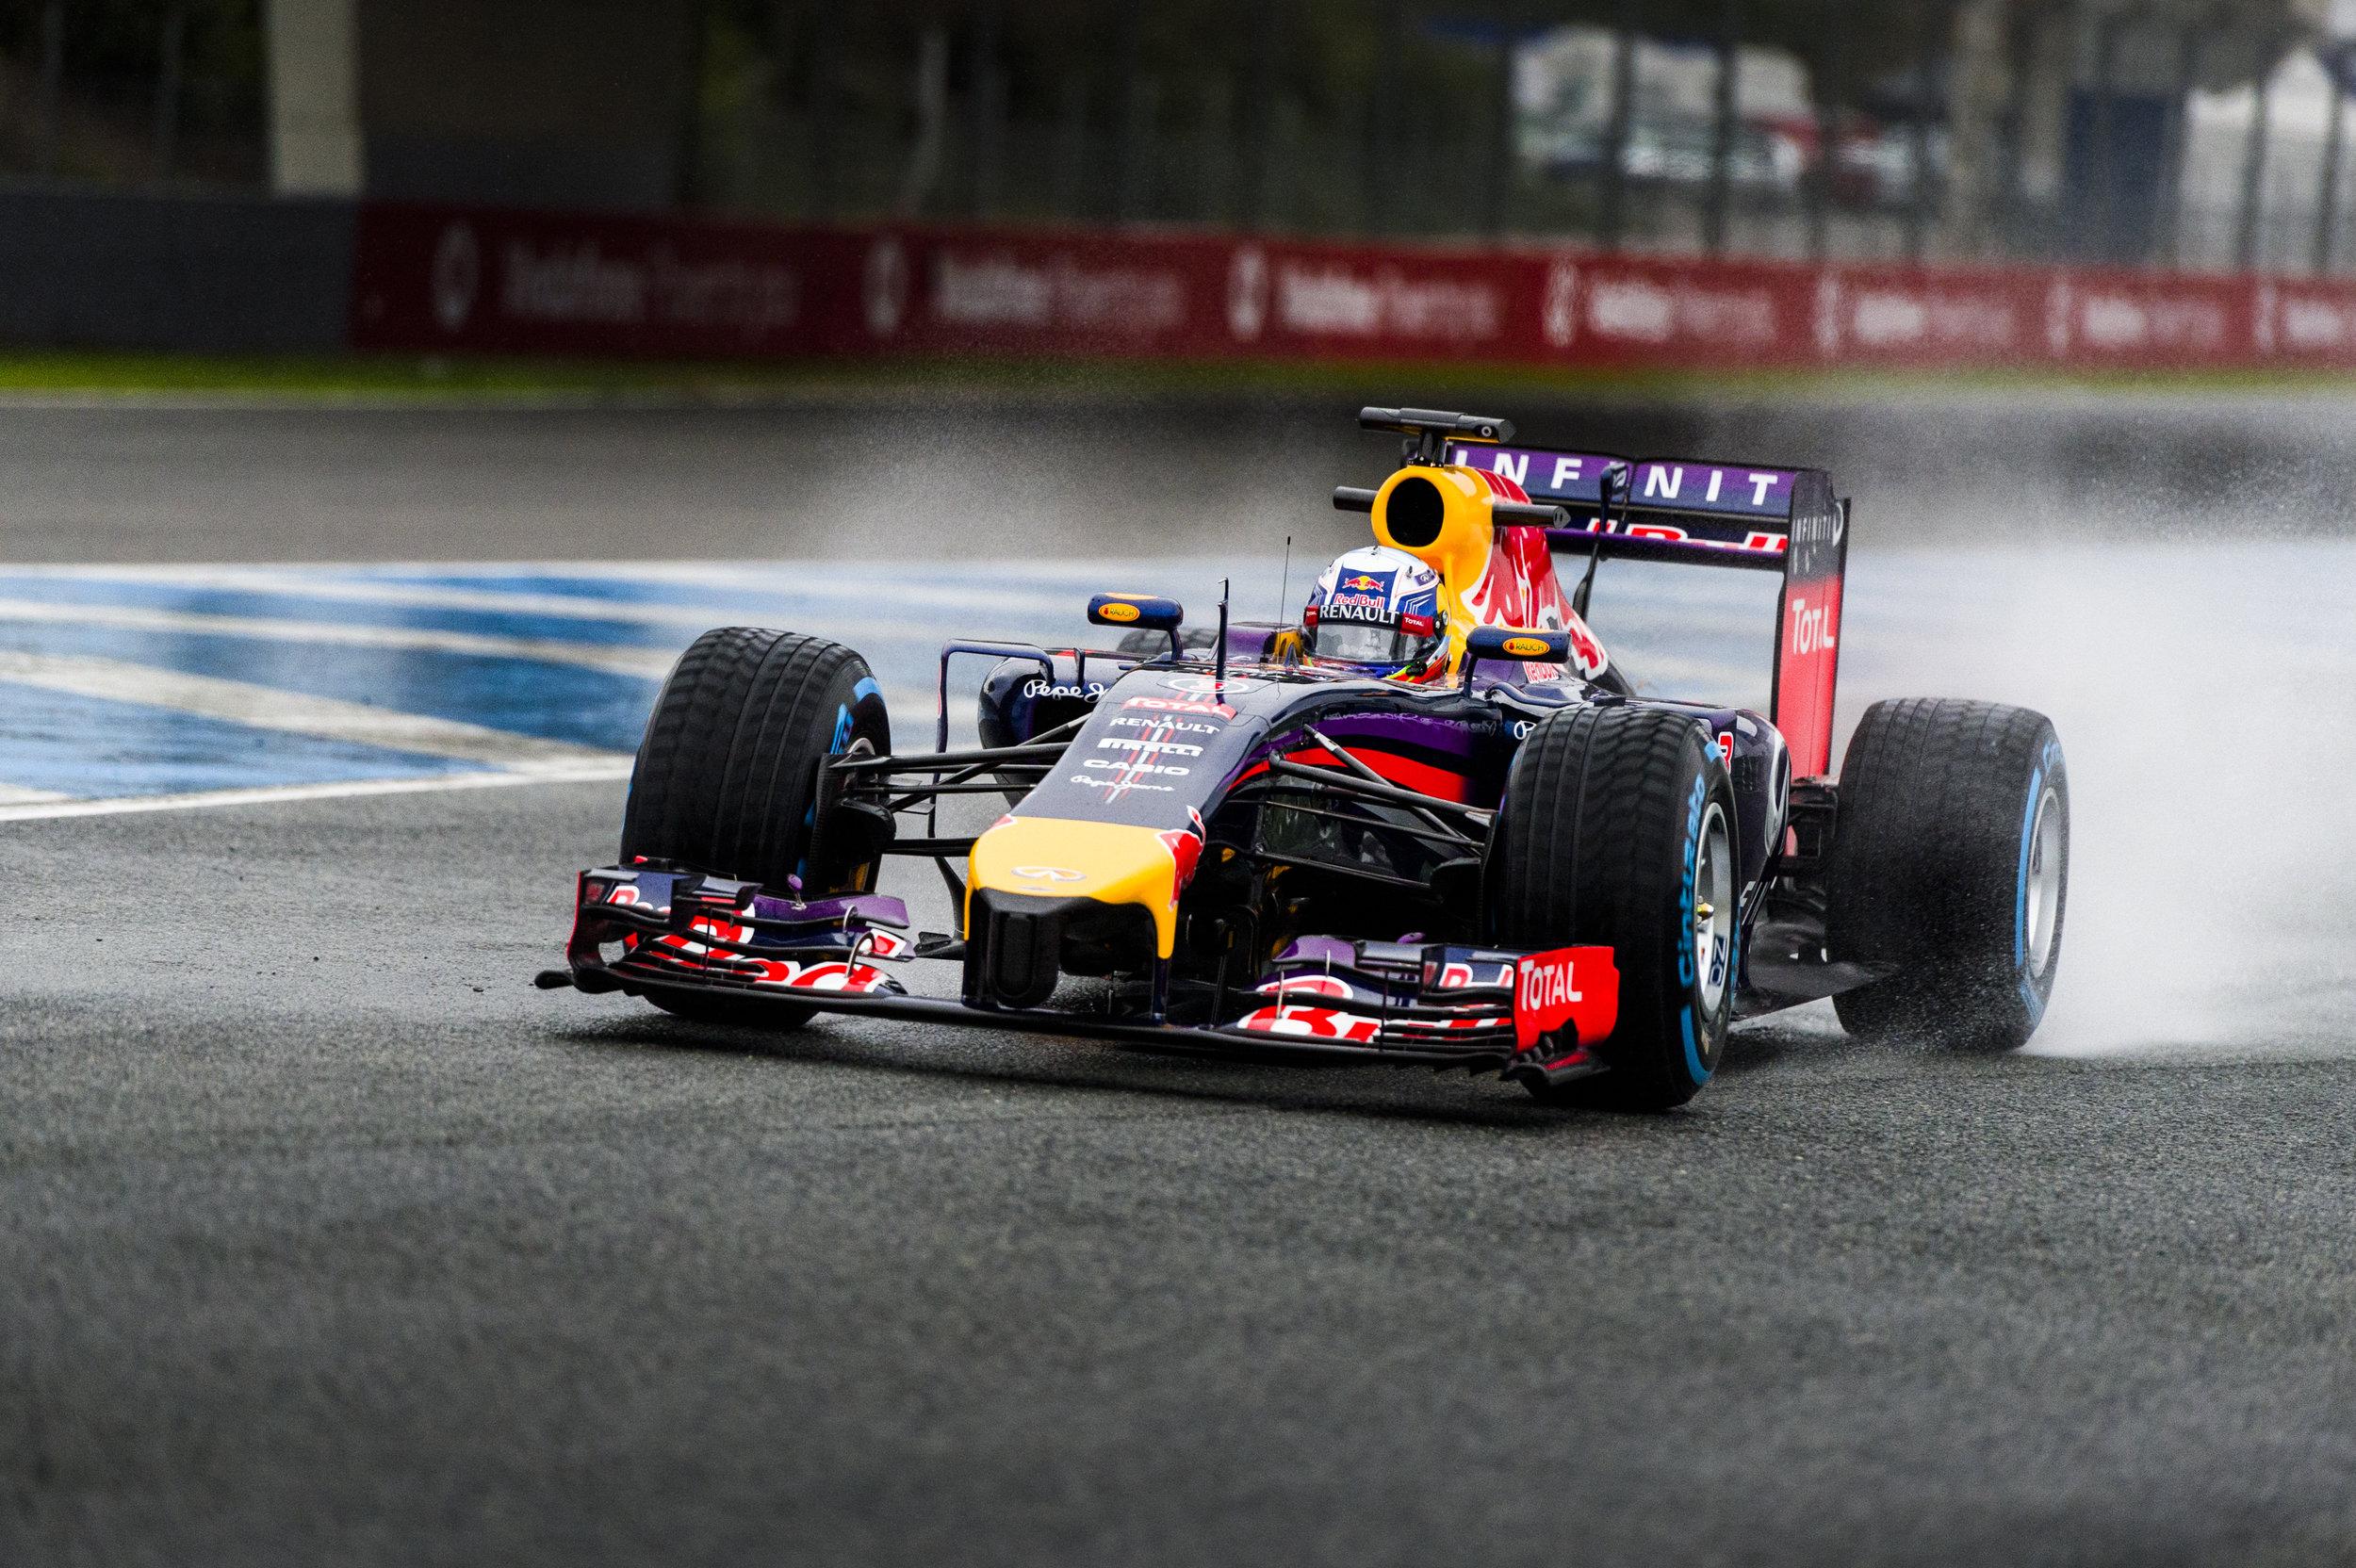 Ricciardo, Red Bull-Renault, 1-45.374, 7 laps. (1 of 1).jpg